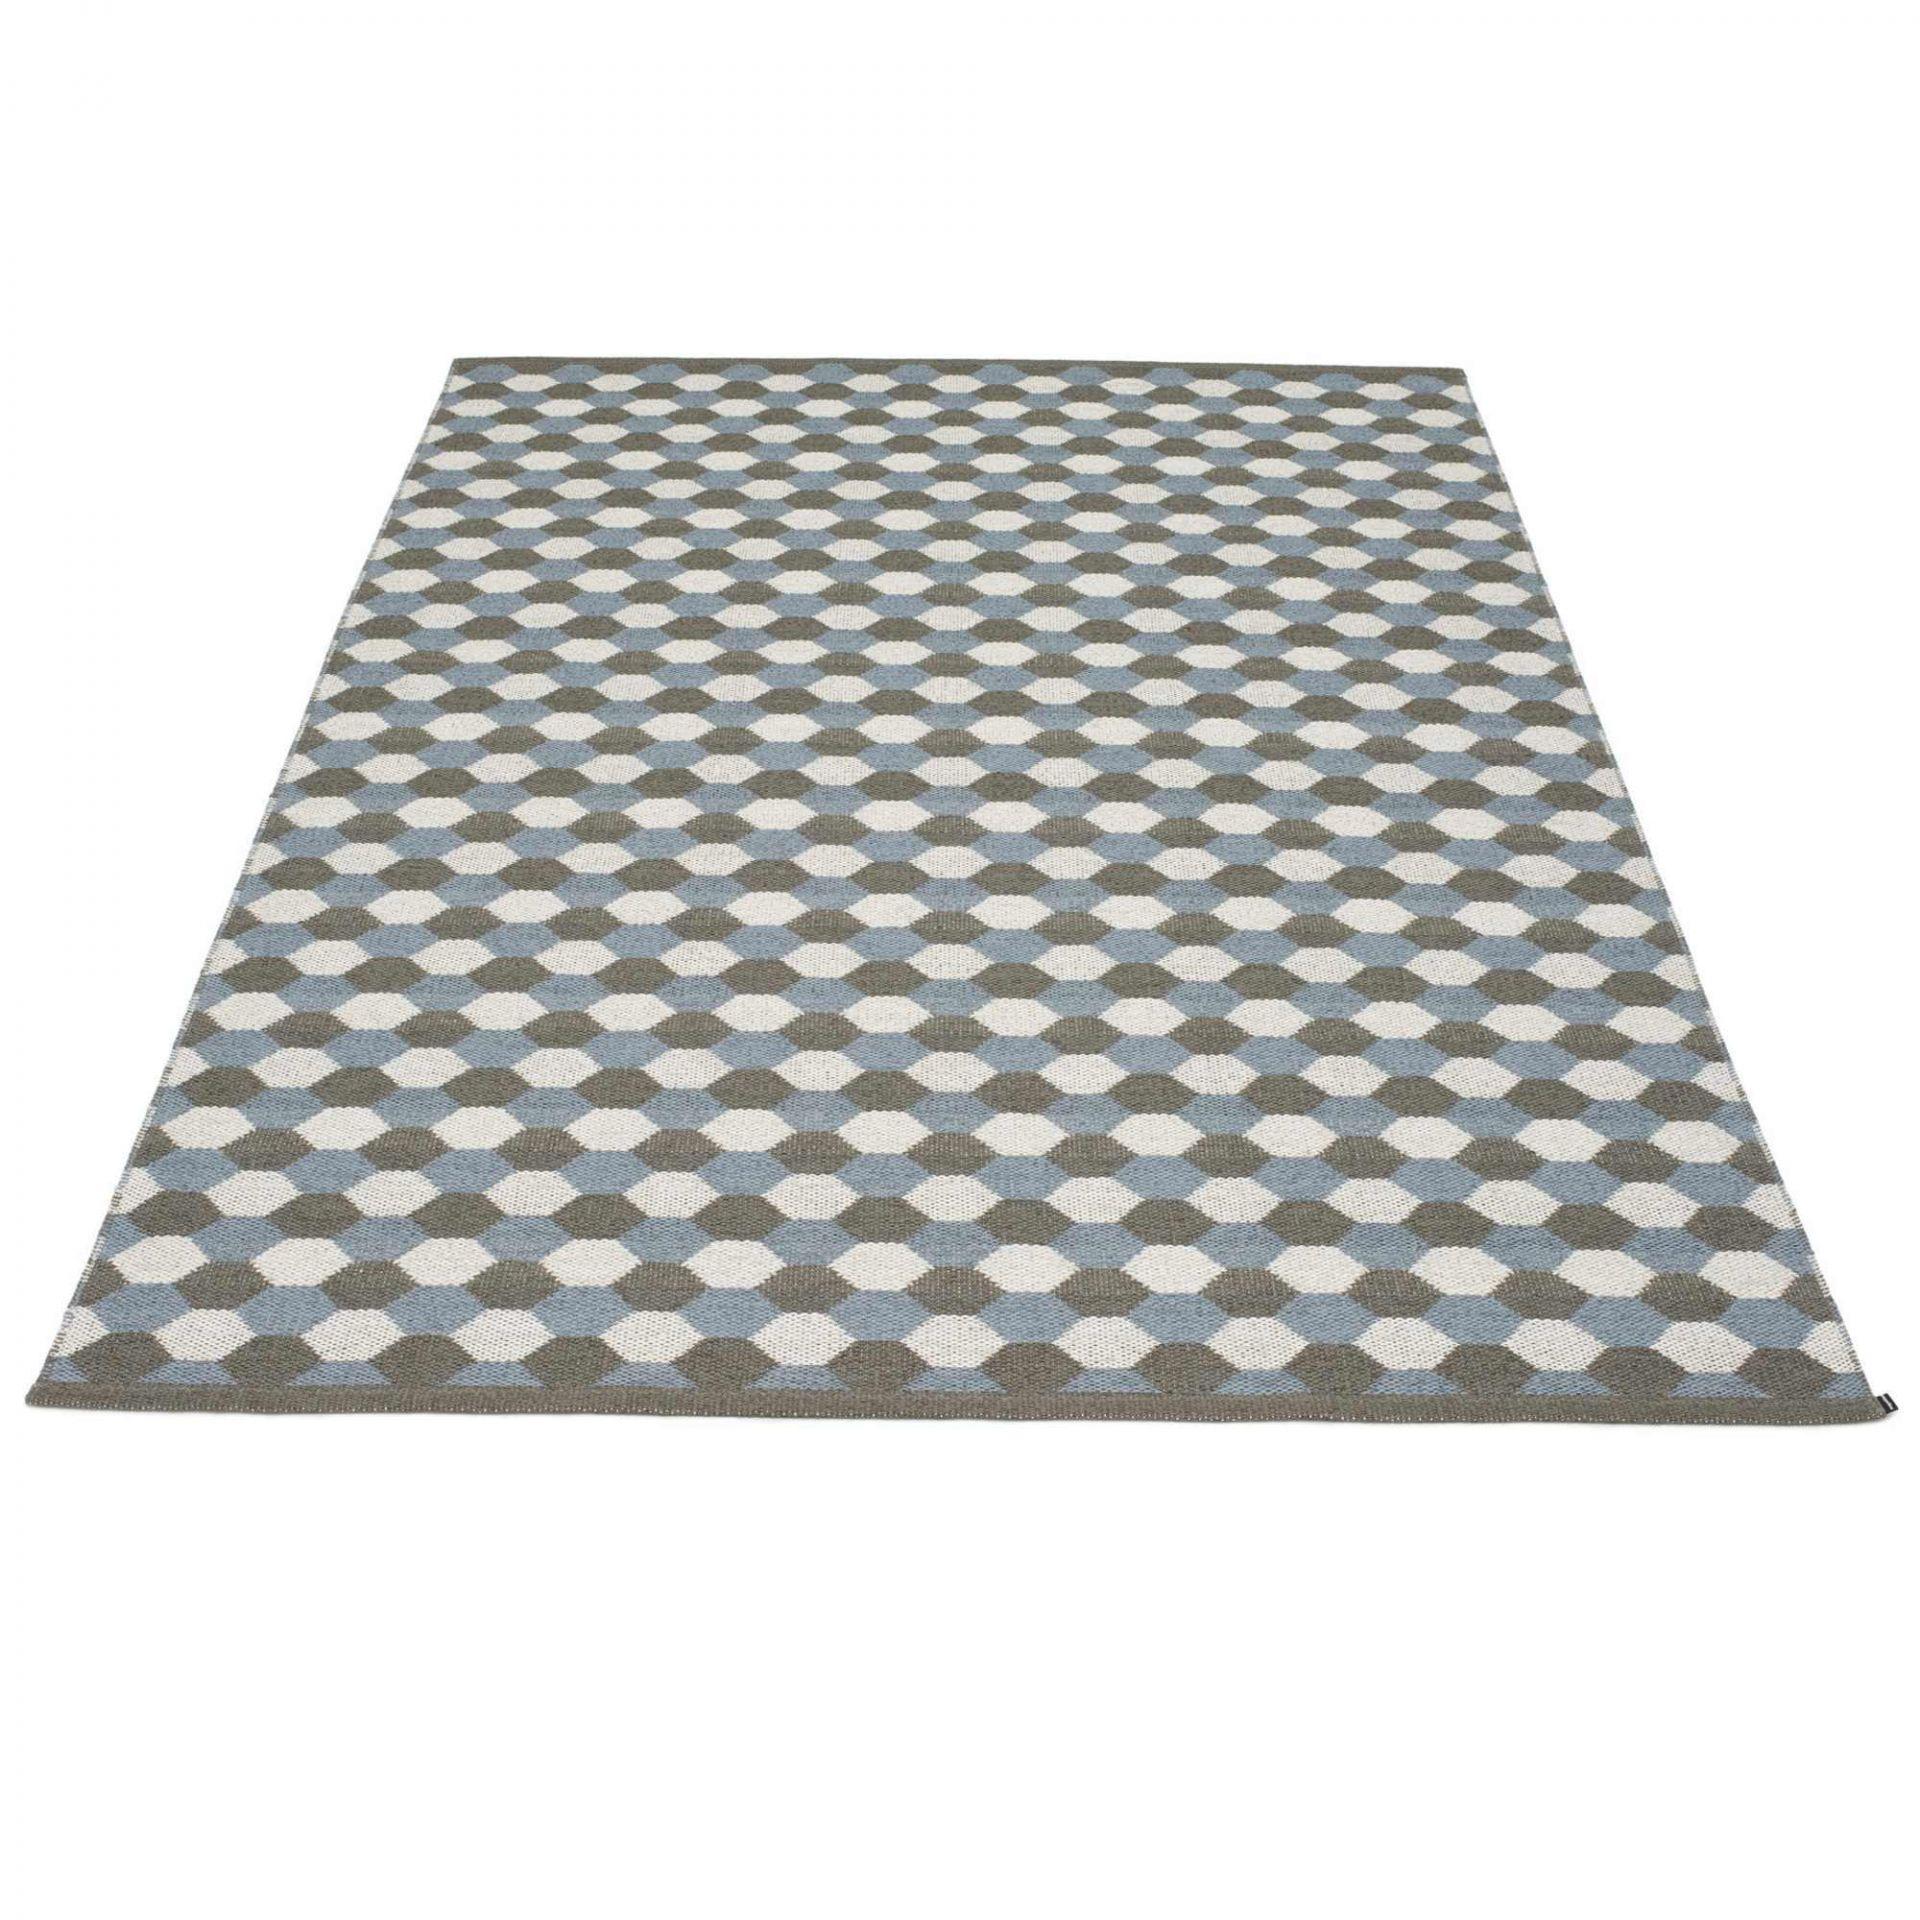 Dana Kunststoffteppich 70x60 Sturm Pappelina